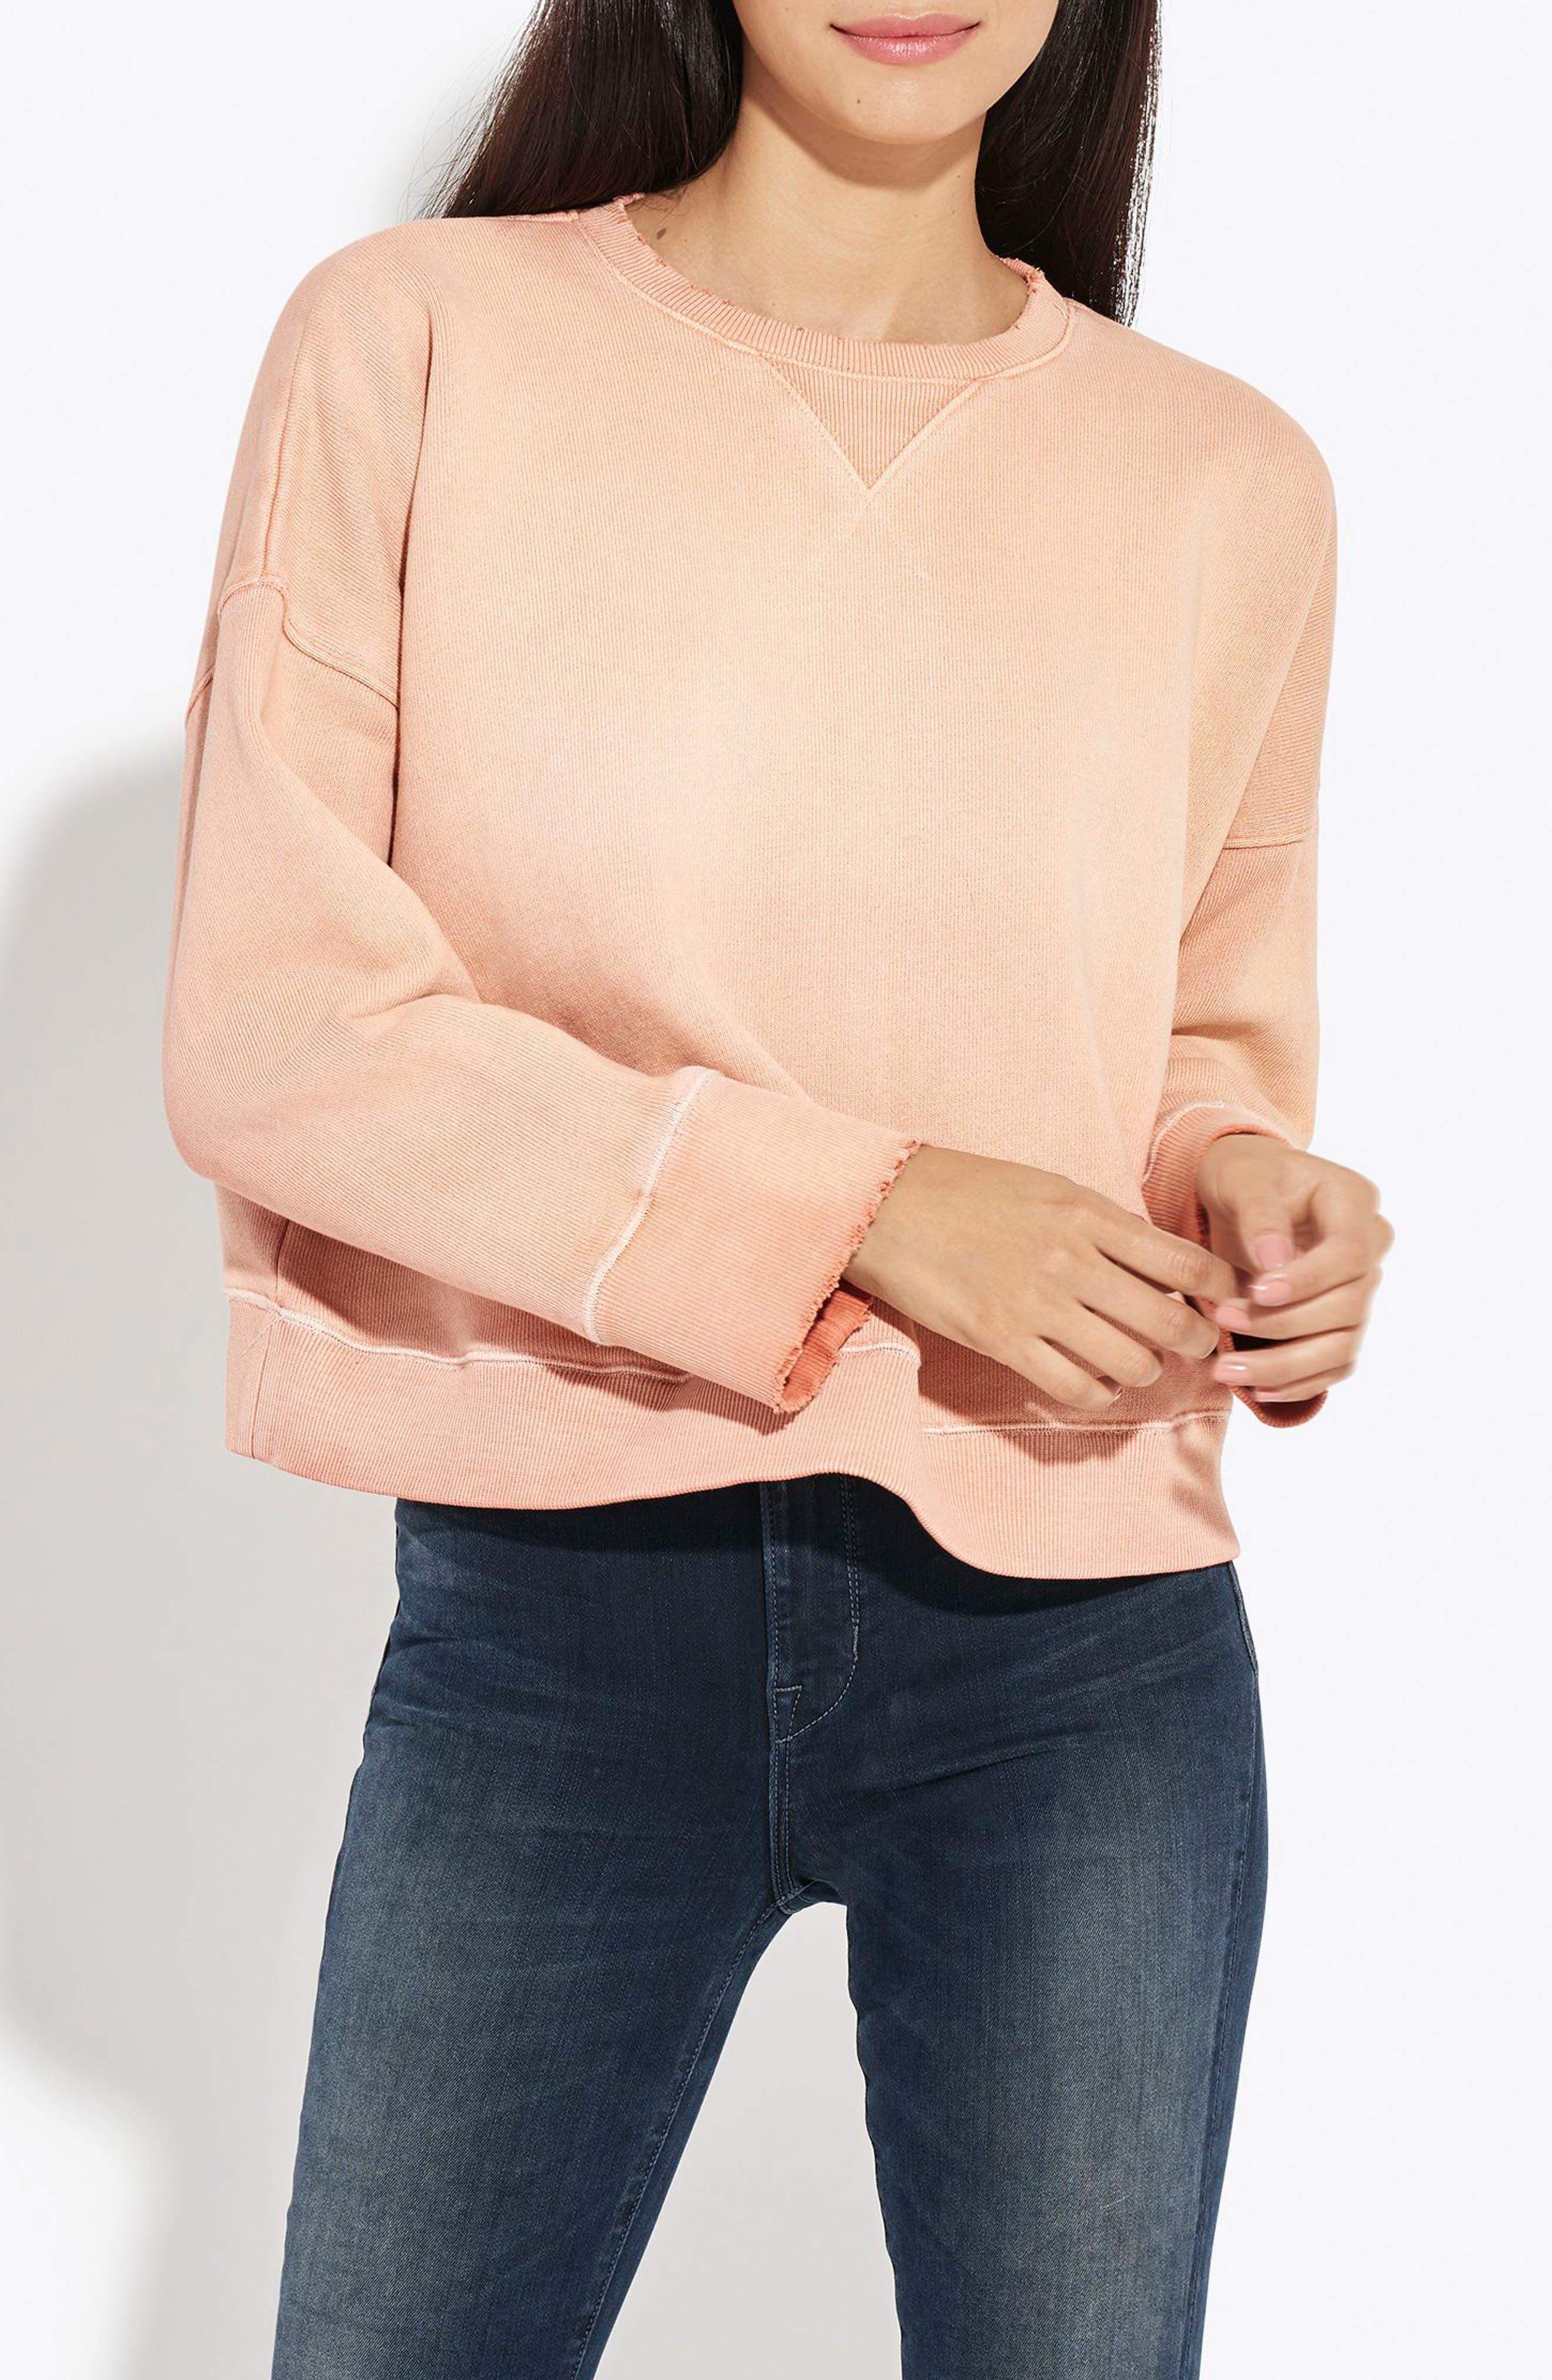 The Big Guy Sweatshirt,                         Main,                         color, Popsicle